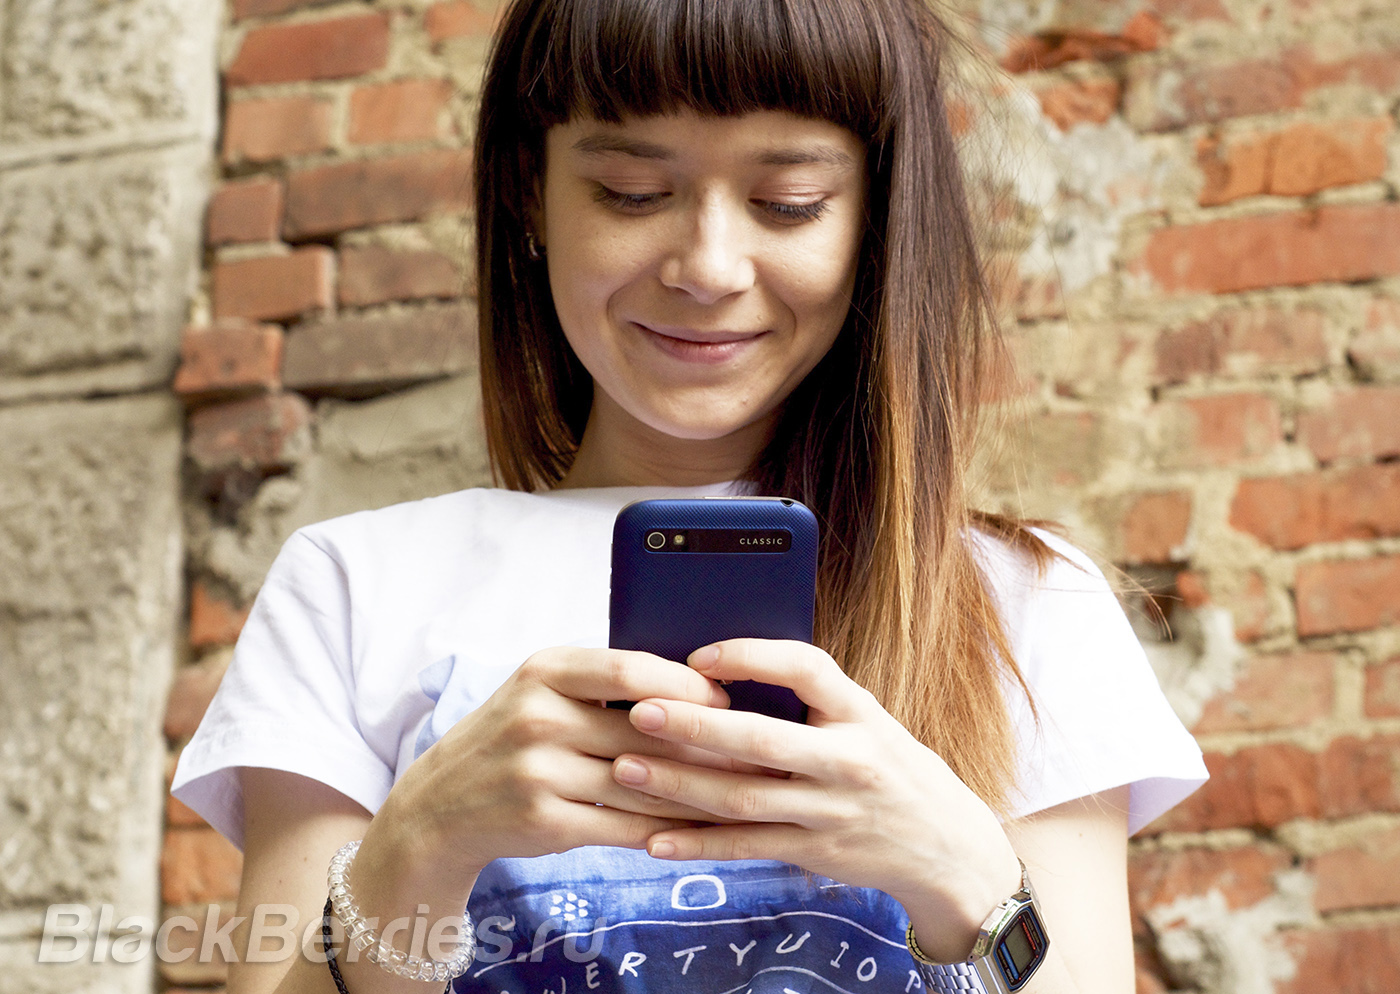 BlackBerry-Classic-Blue-Rus-2